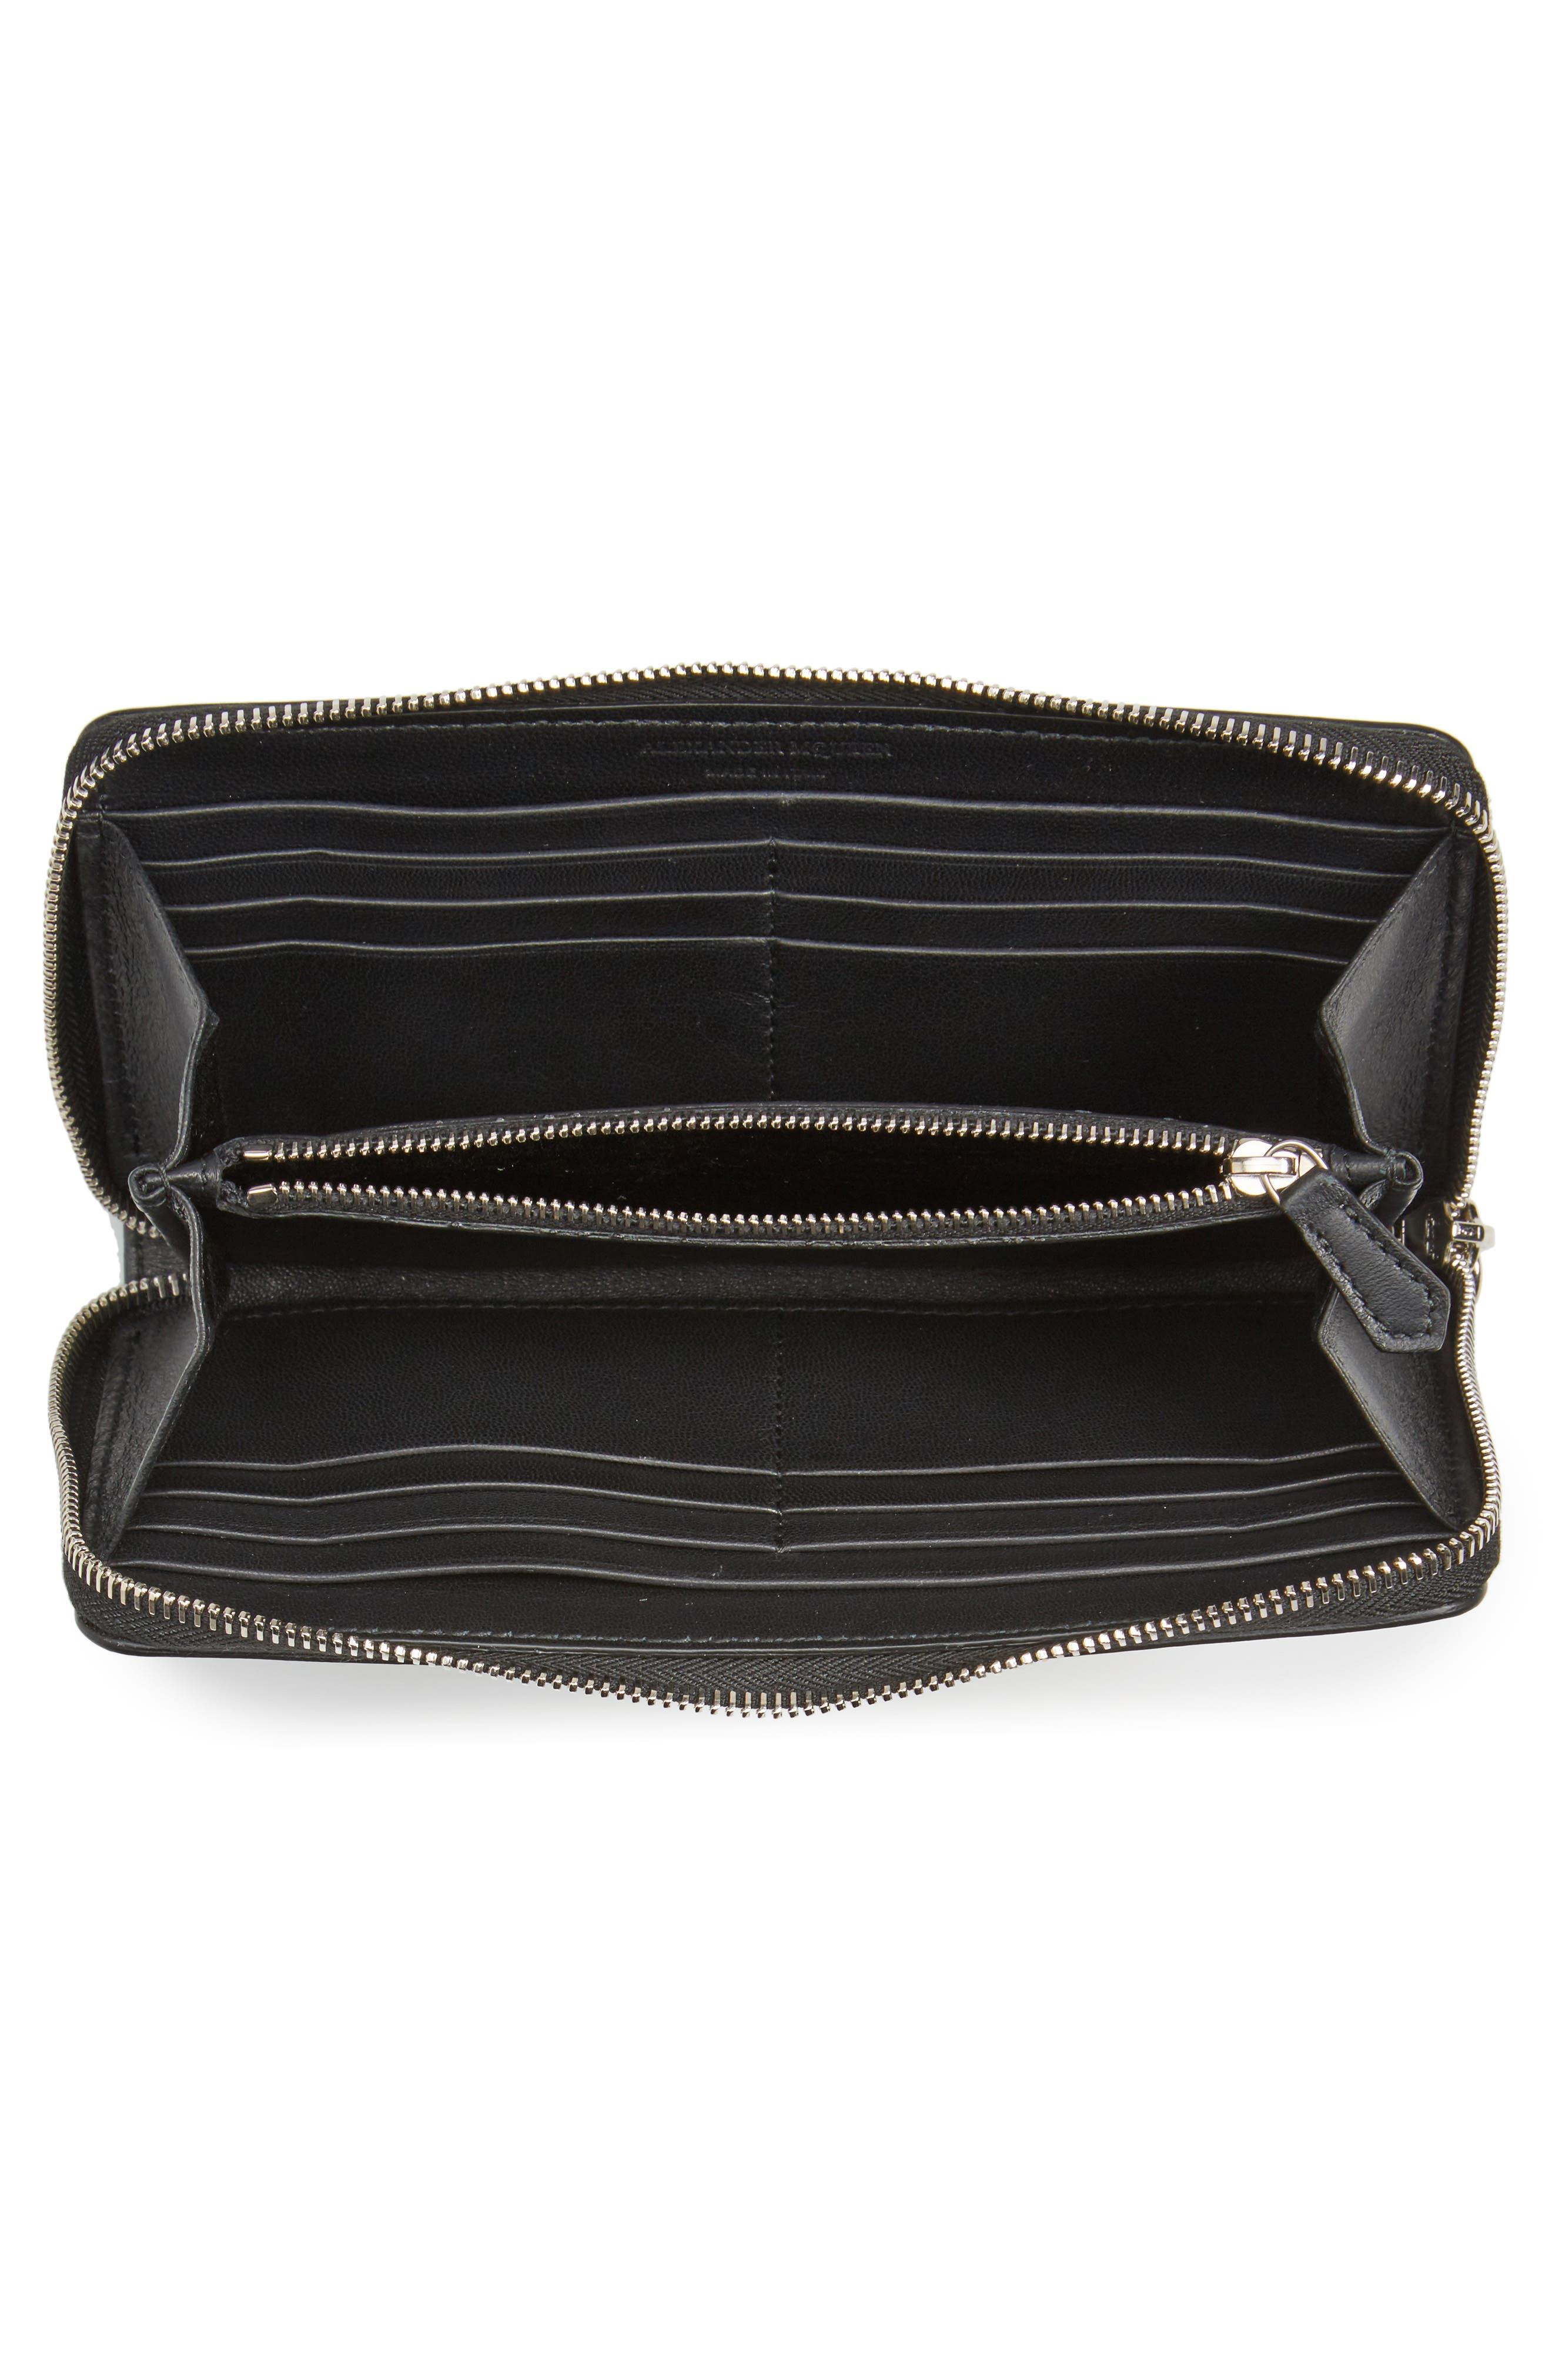 Alternate Image 2  - Alexander McQueen Grommet & Stud Calfskin Leather Continental Wallet